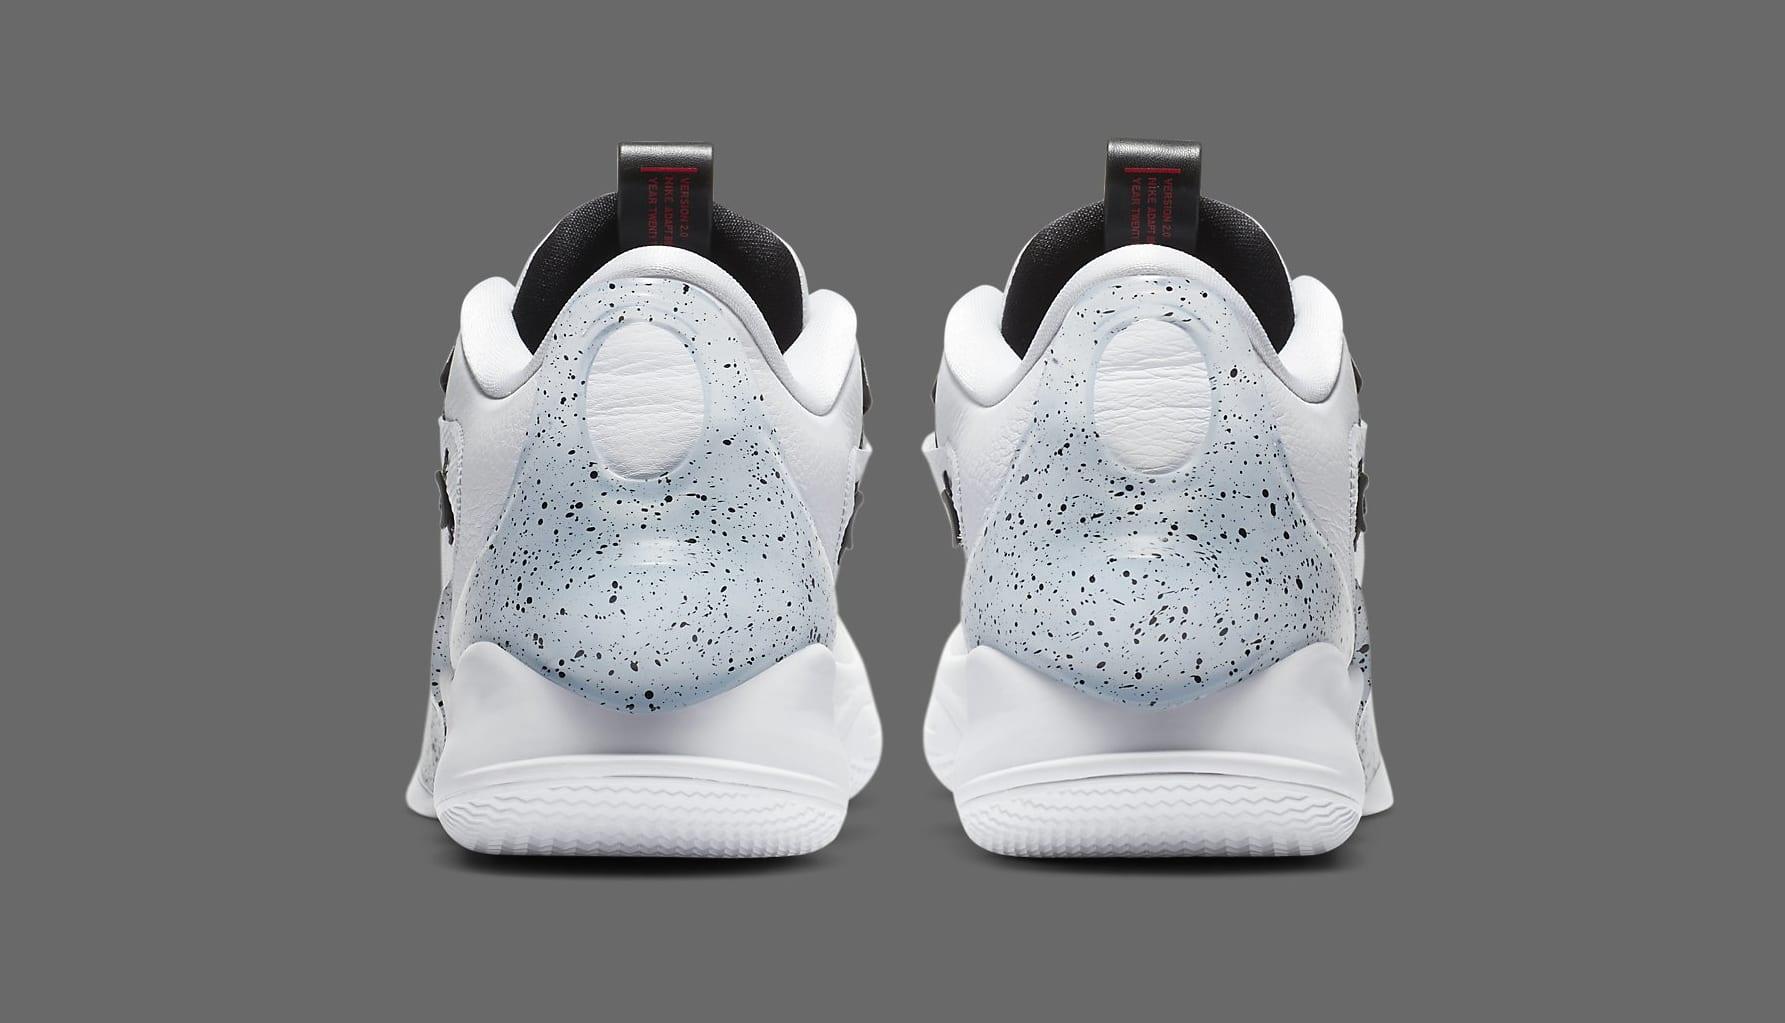 Nike Adapt BB 2.0 'Oreo' BQ5397-101 Heel